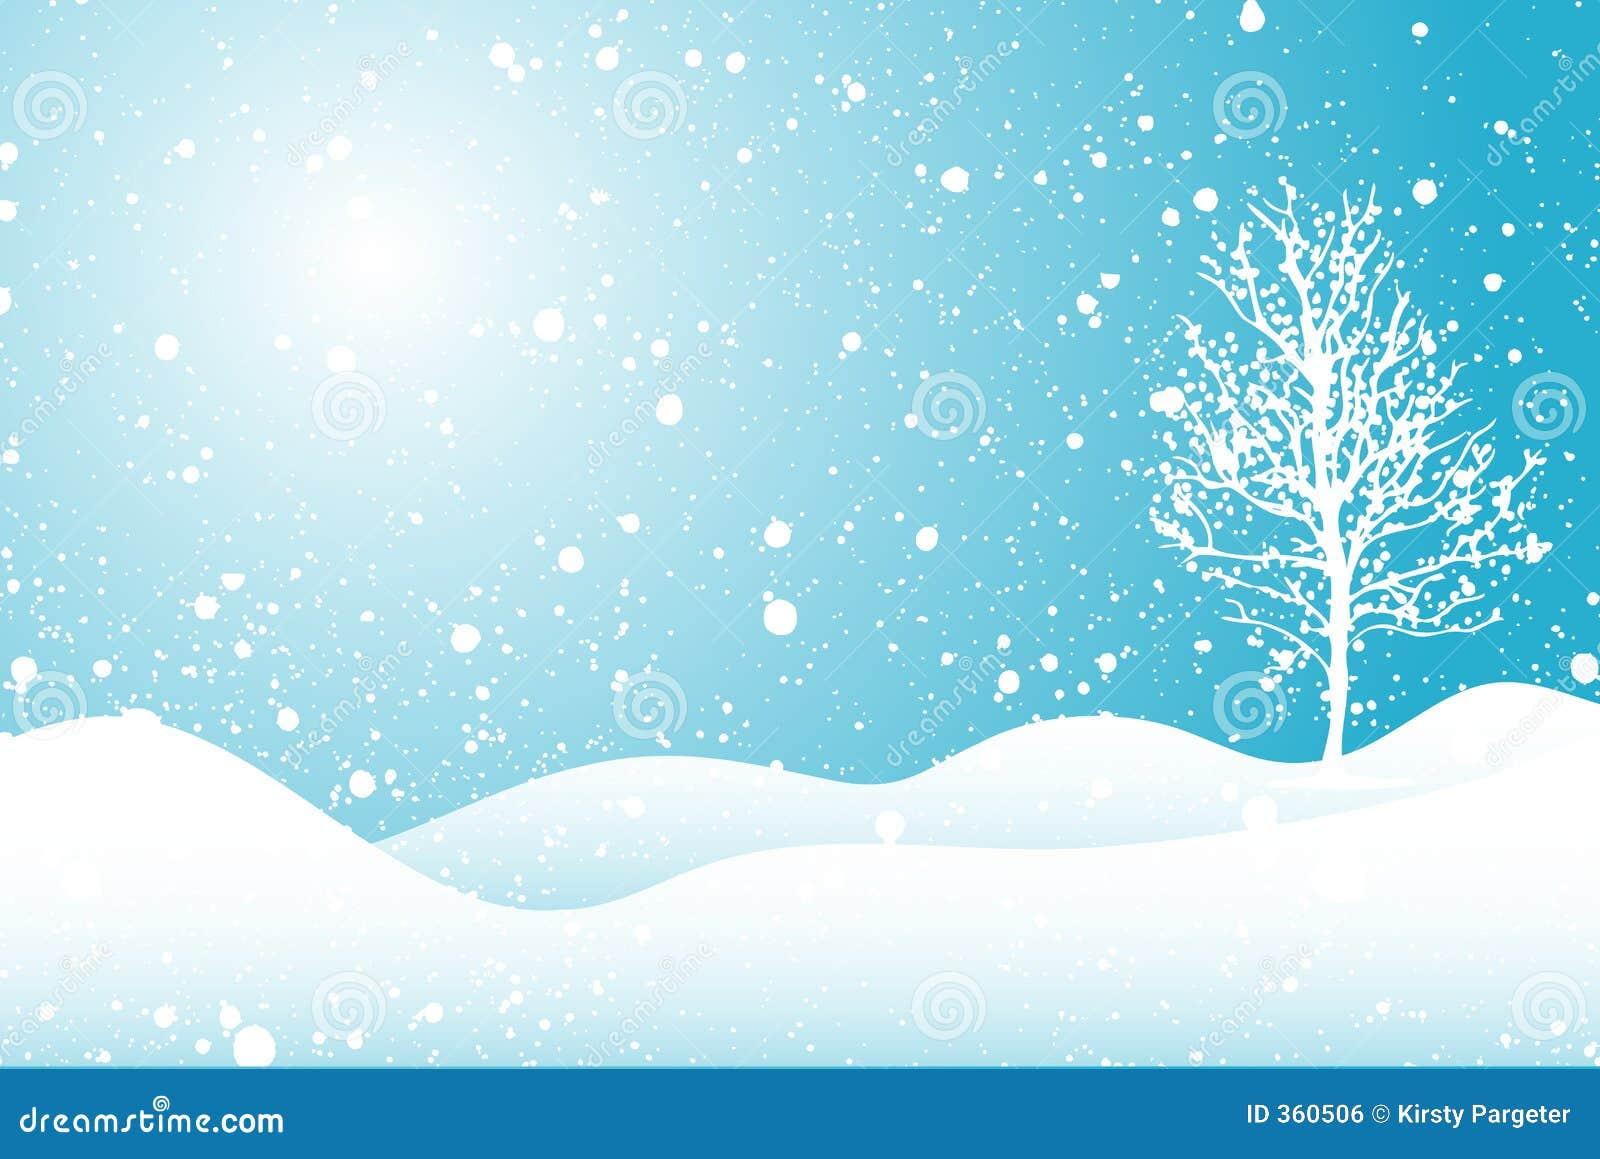 clipart snow scene - photo #4